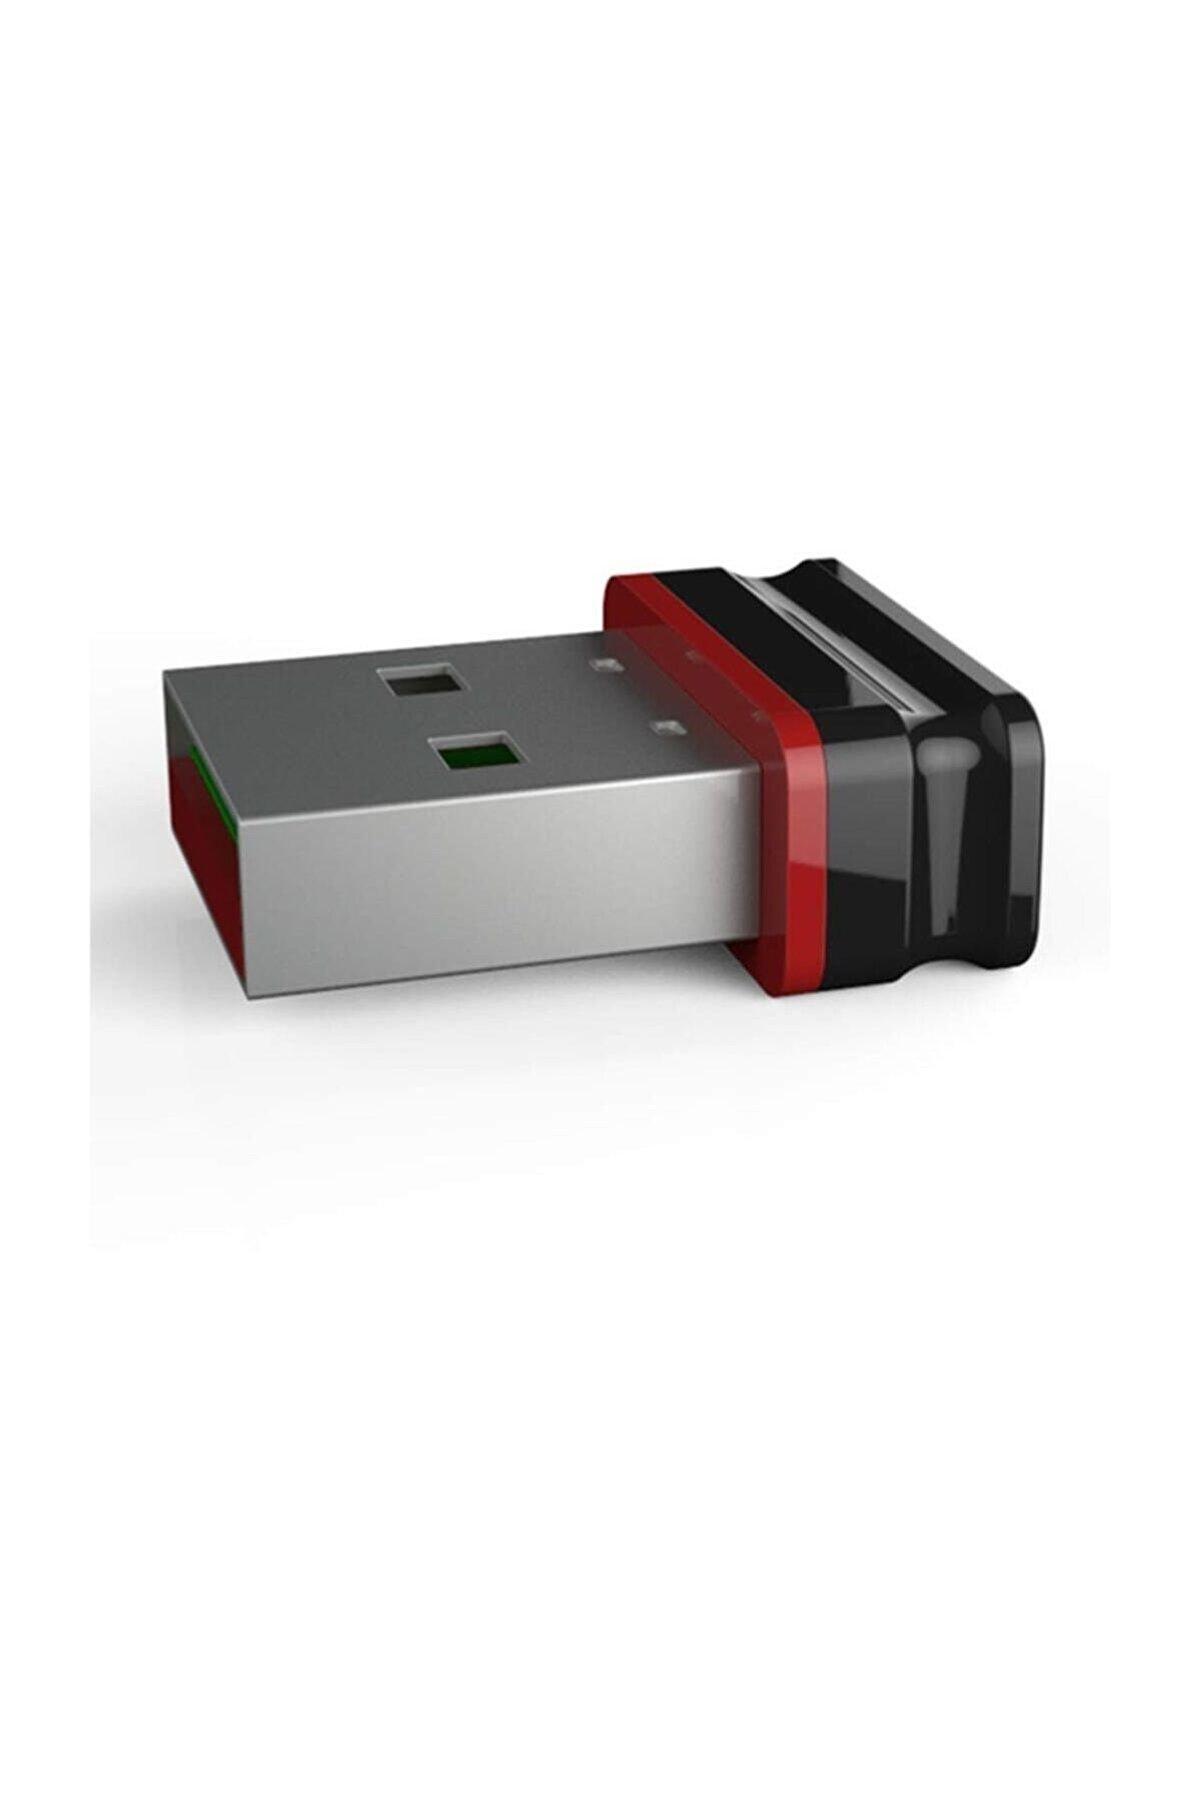 versatile 300 Mbps Nano Mini Wireless Adaptörü Kablosuz Ağ Pc Wifi Alıcı